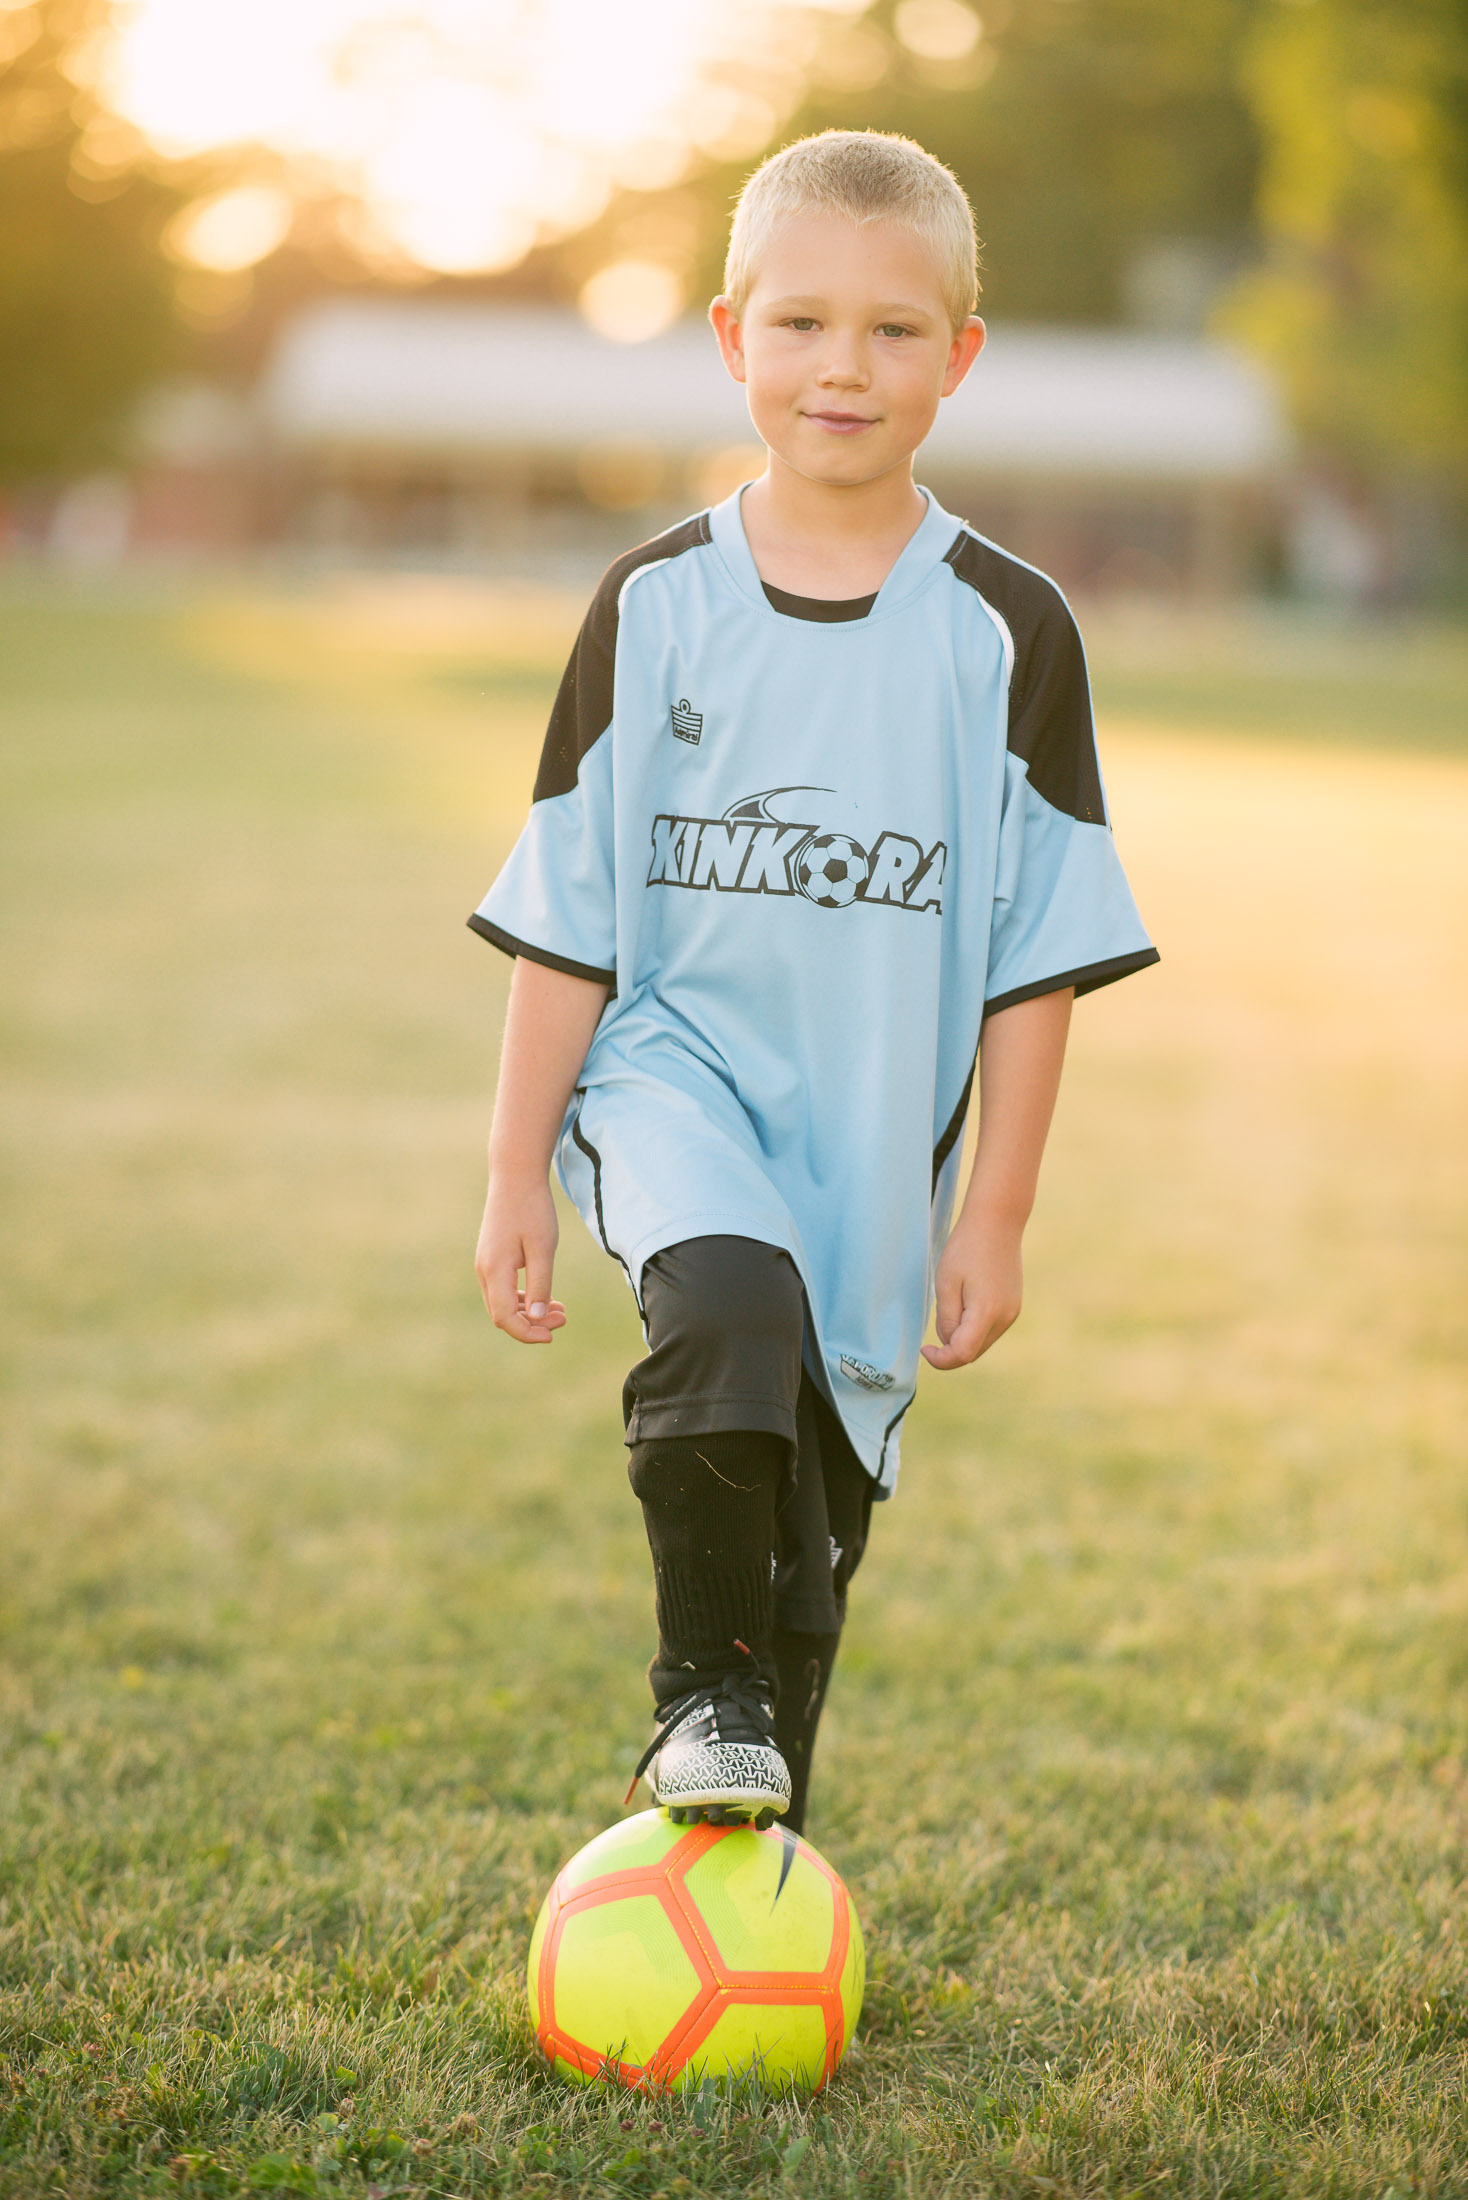 Kinkora-Soccer-Photos-054.jpg